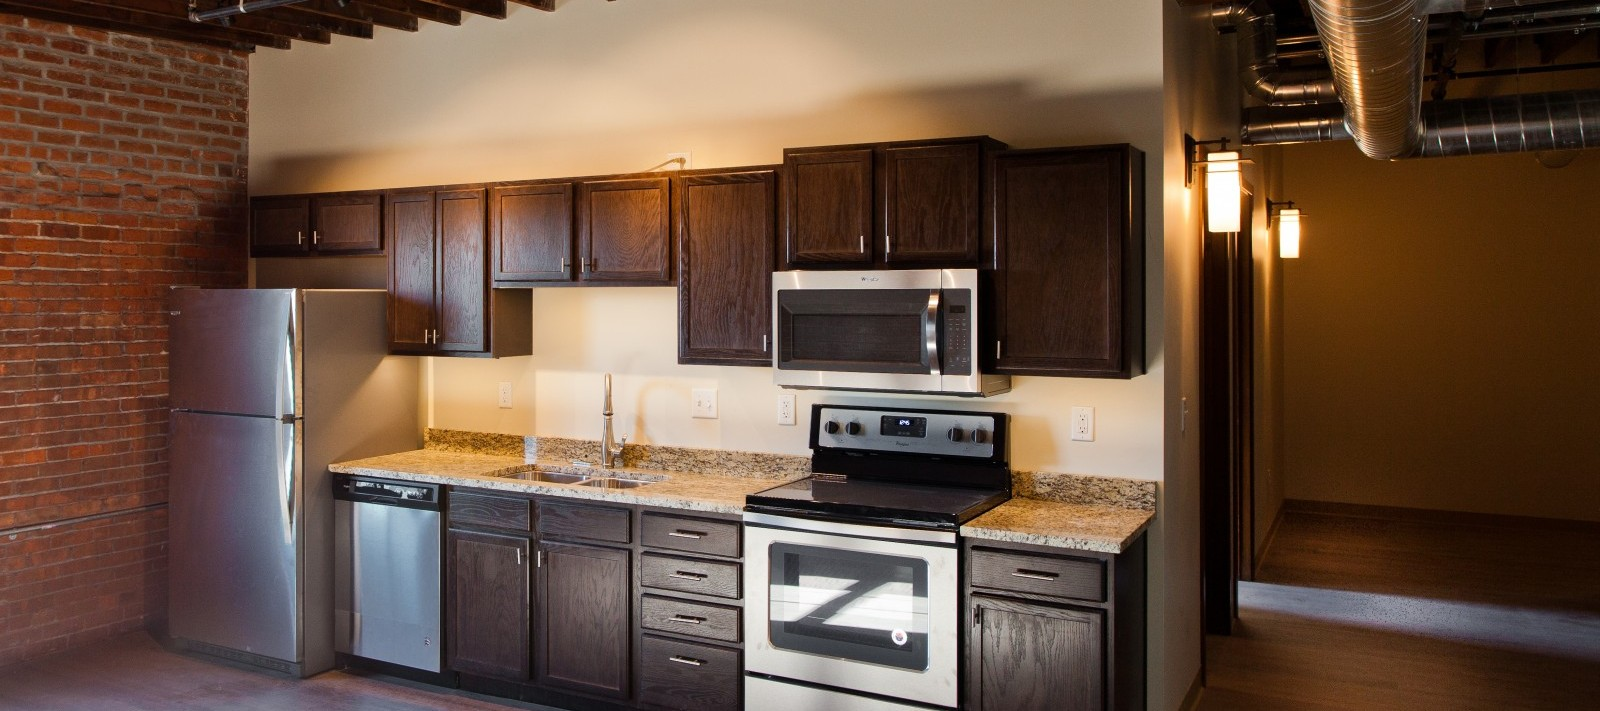 Pershing Lofts kitchen